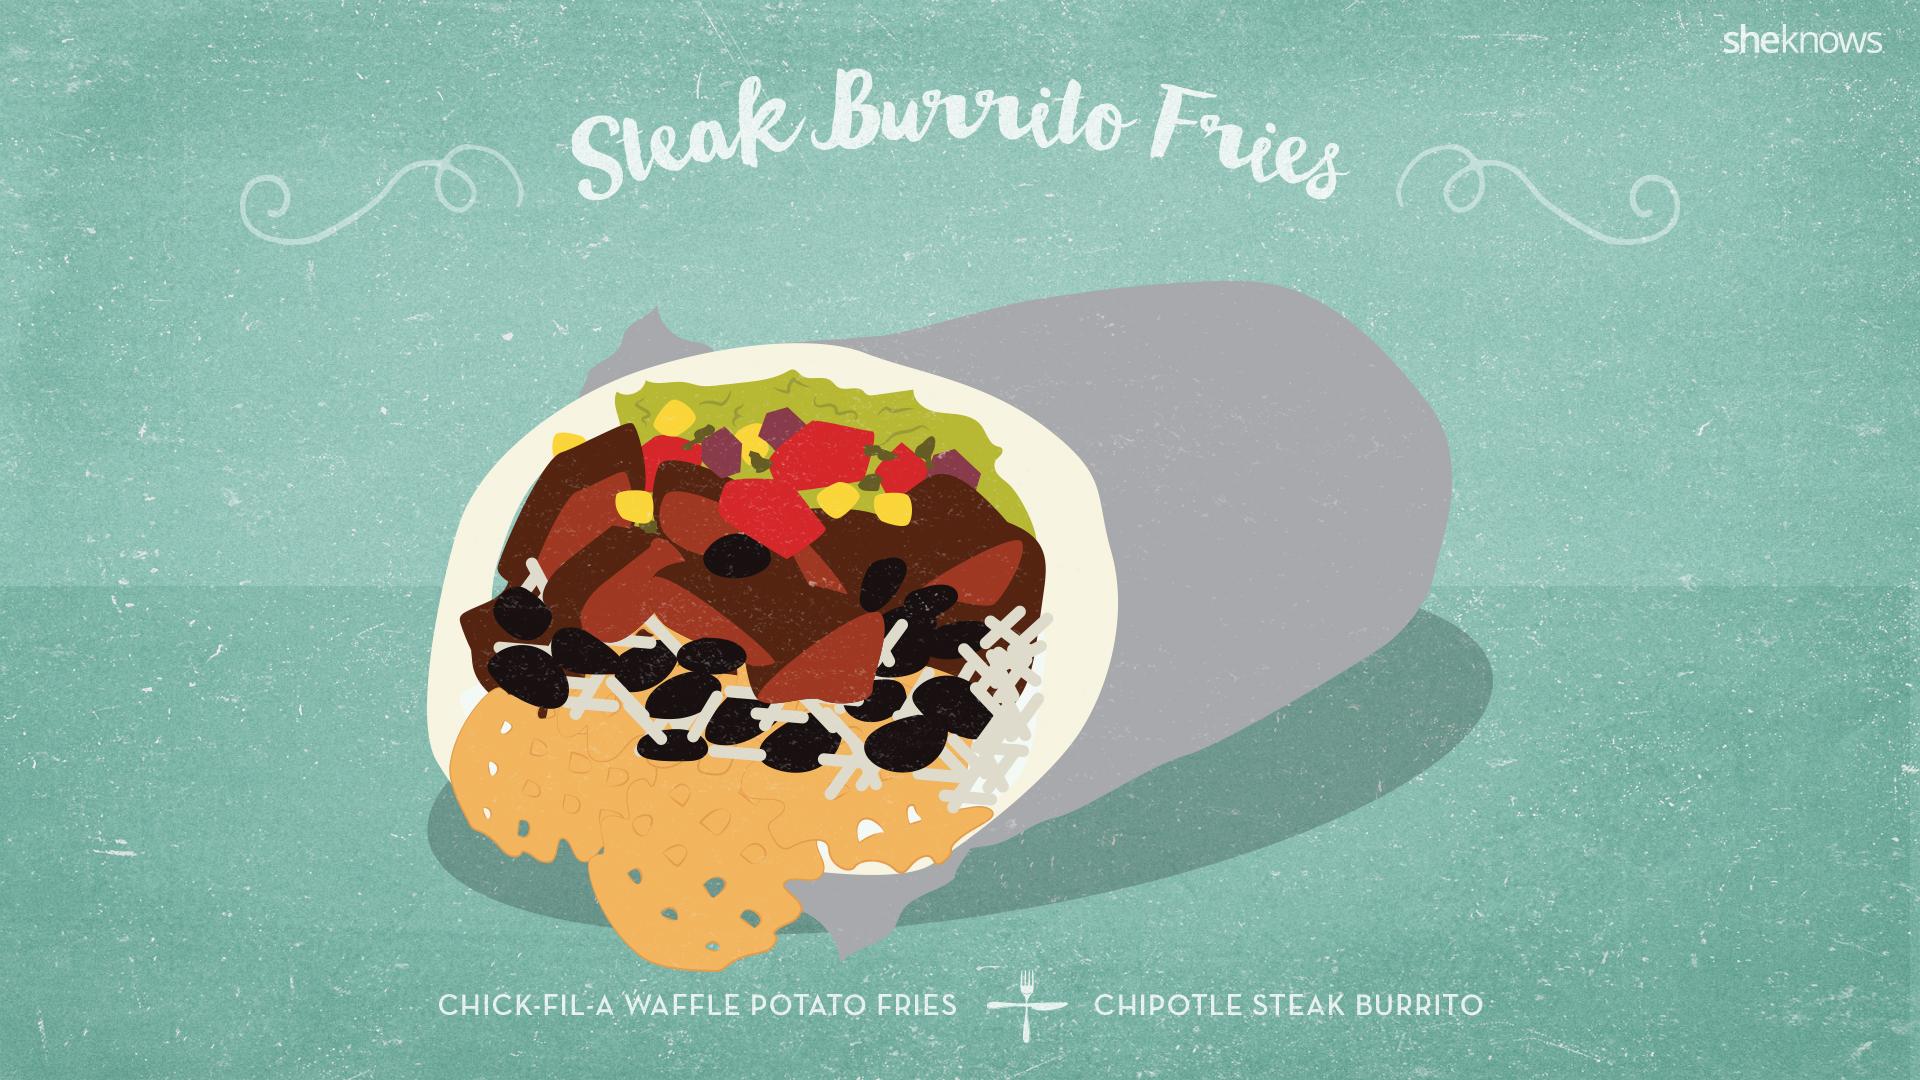 Steak Burrito Fries